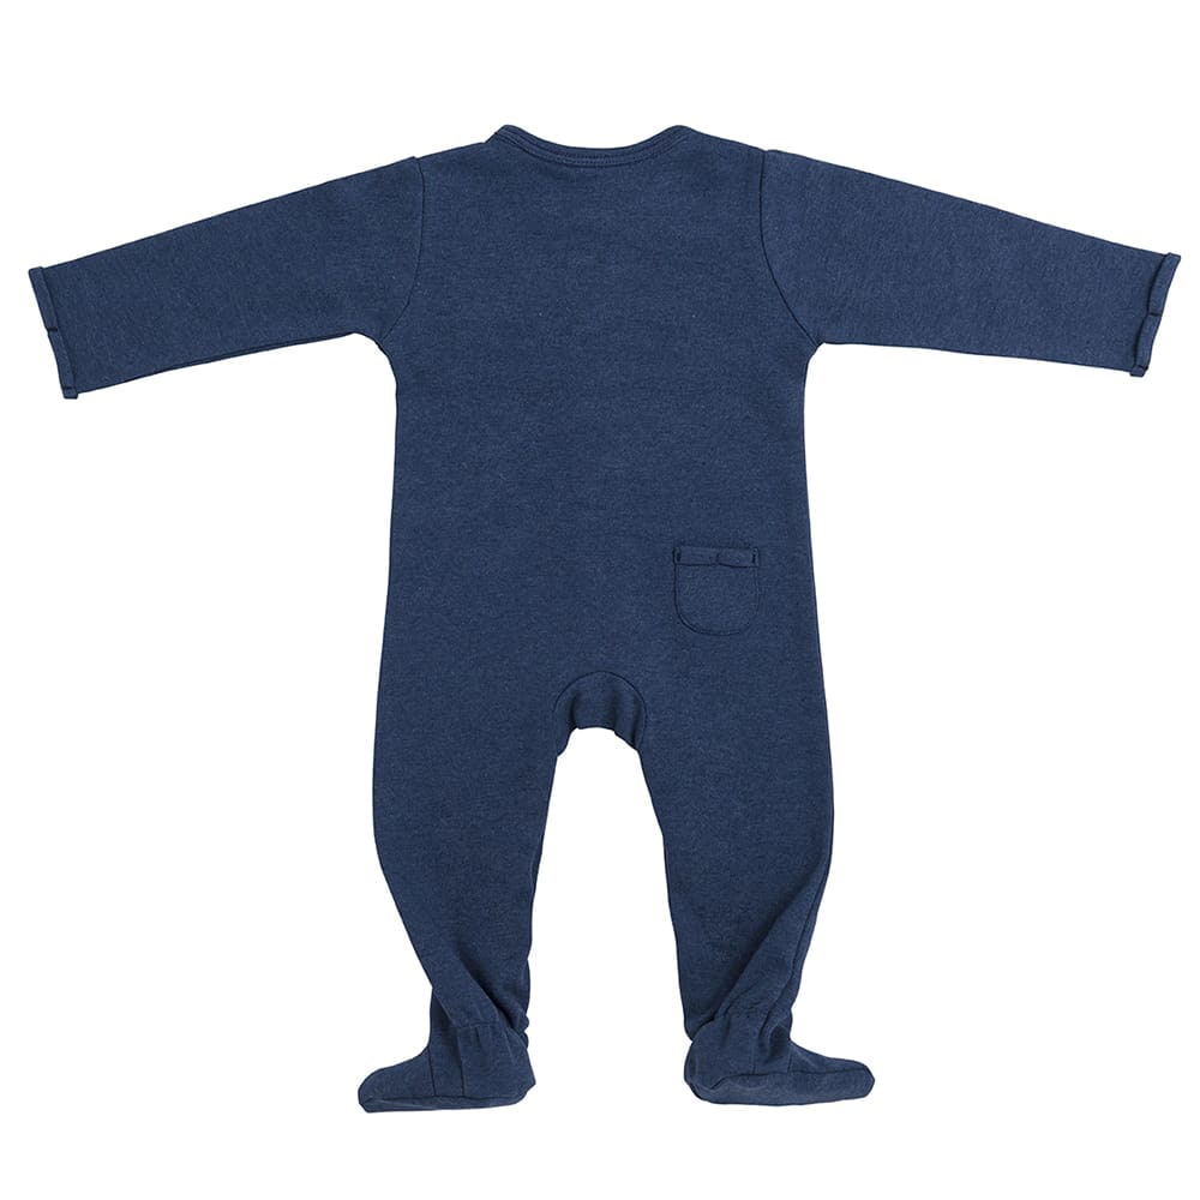 babys only 3545628 boxpakje met voetjes melange 5056 jeans 2